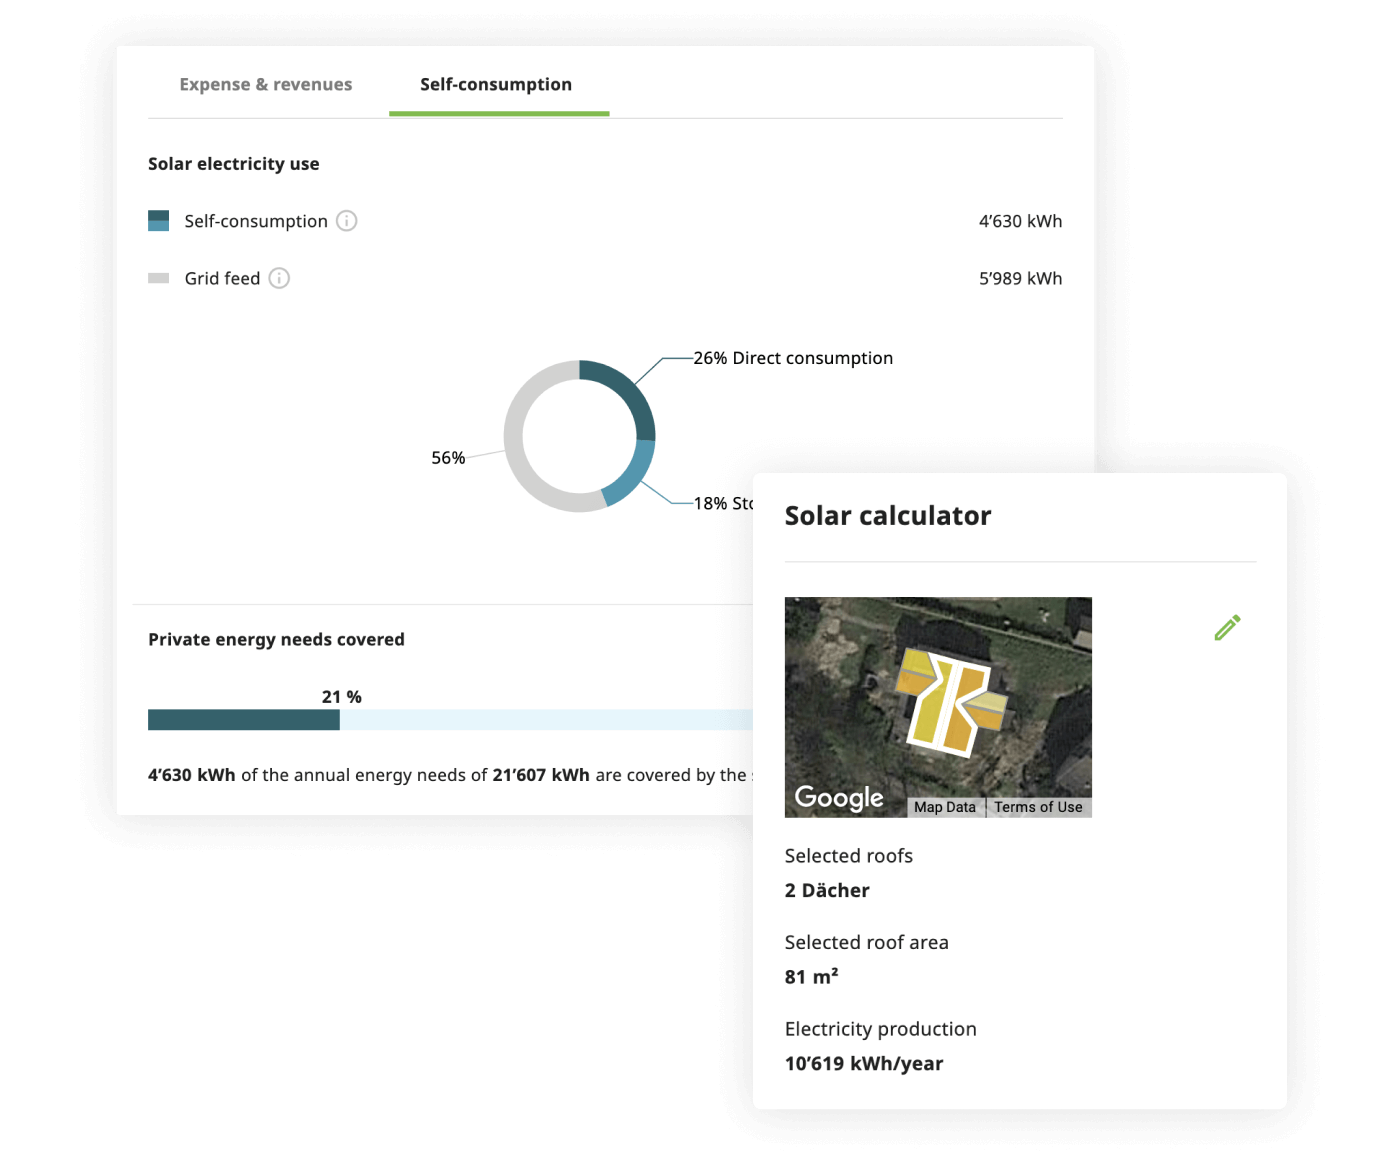 Solar calculator - compute energy needed